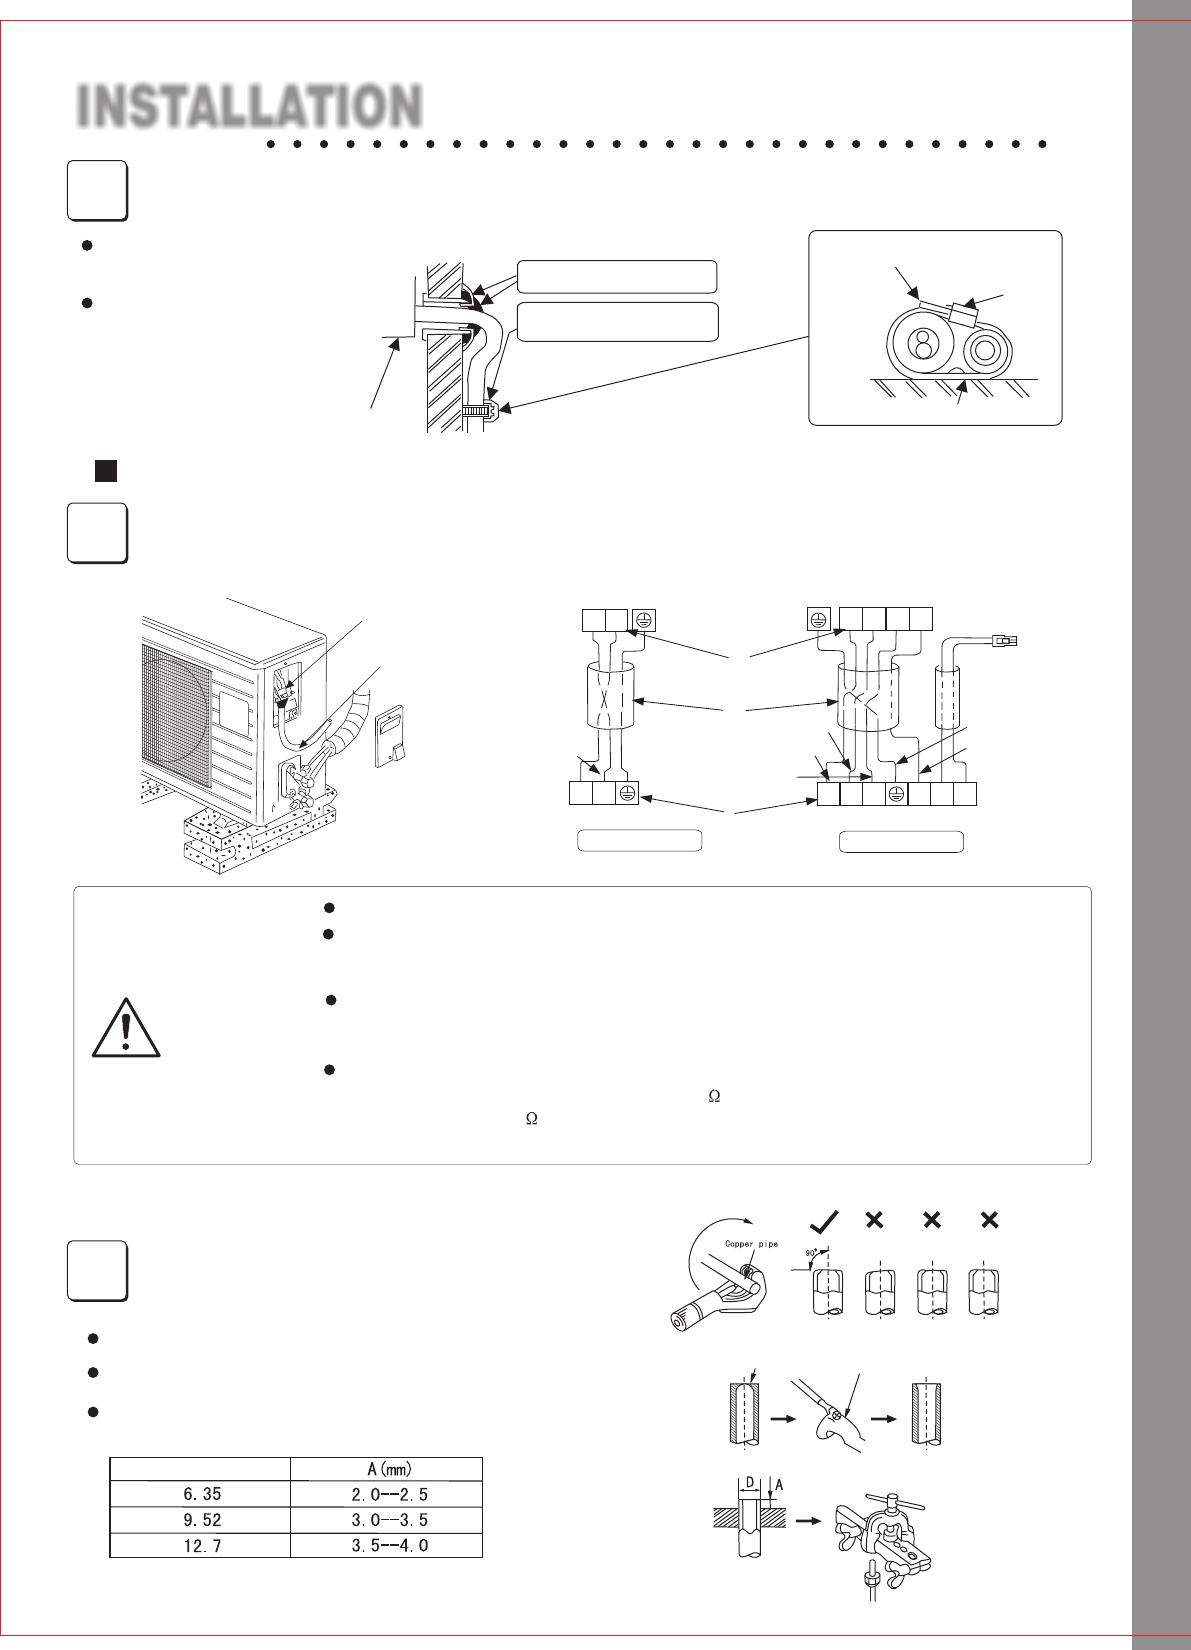 Handleiding Galanz Aus 12cr53ca2 Pagina 17 Van 23 English Air Conditioner Wiring Diagram Burr